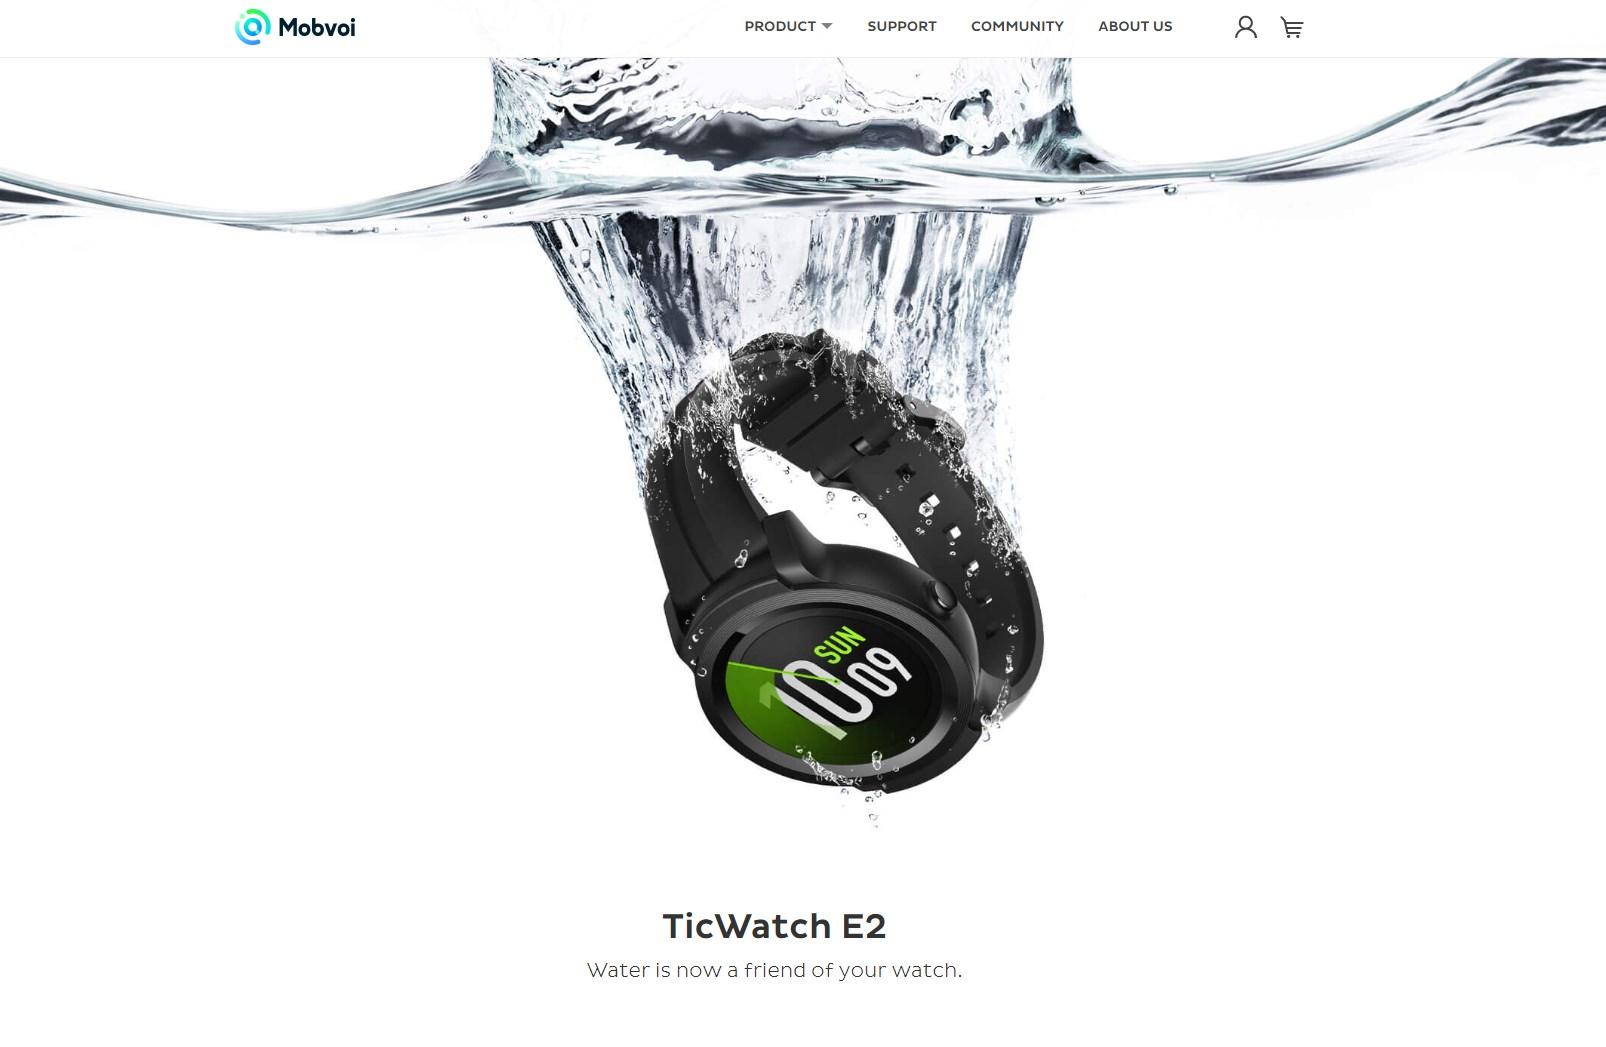 mobvoi ticwatch e2 teaser site